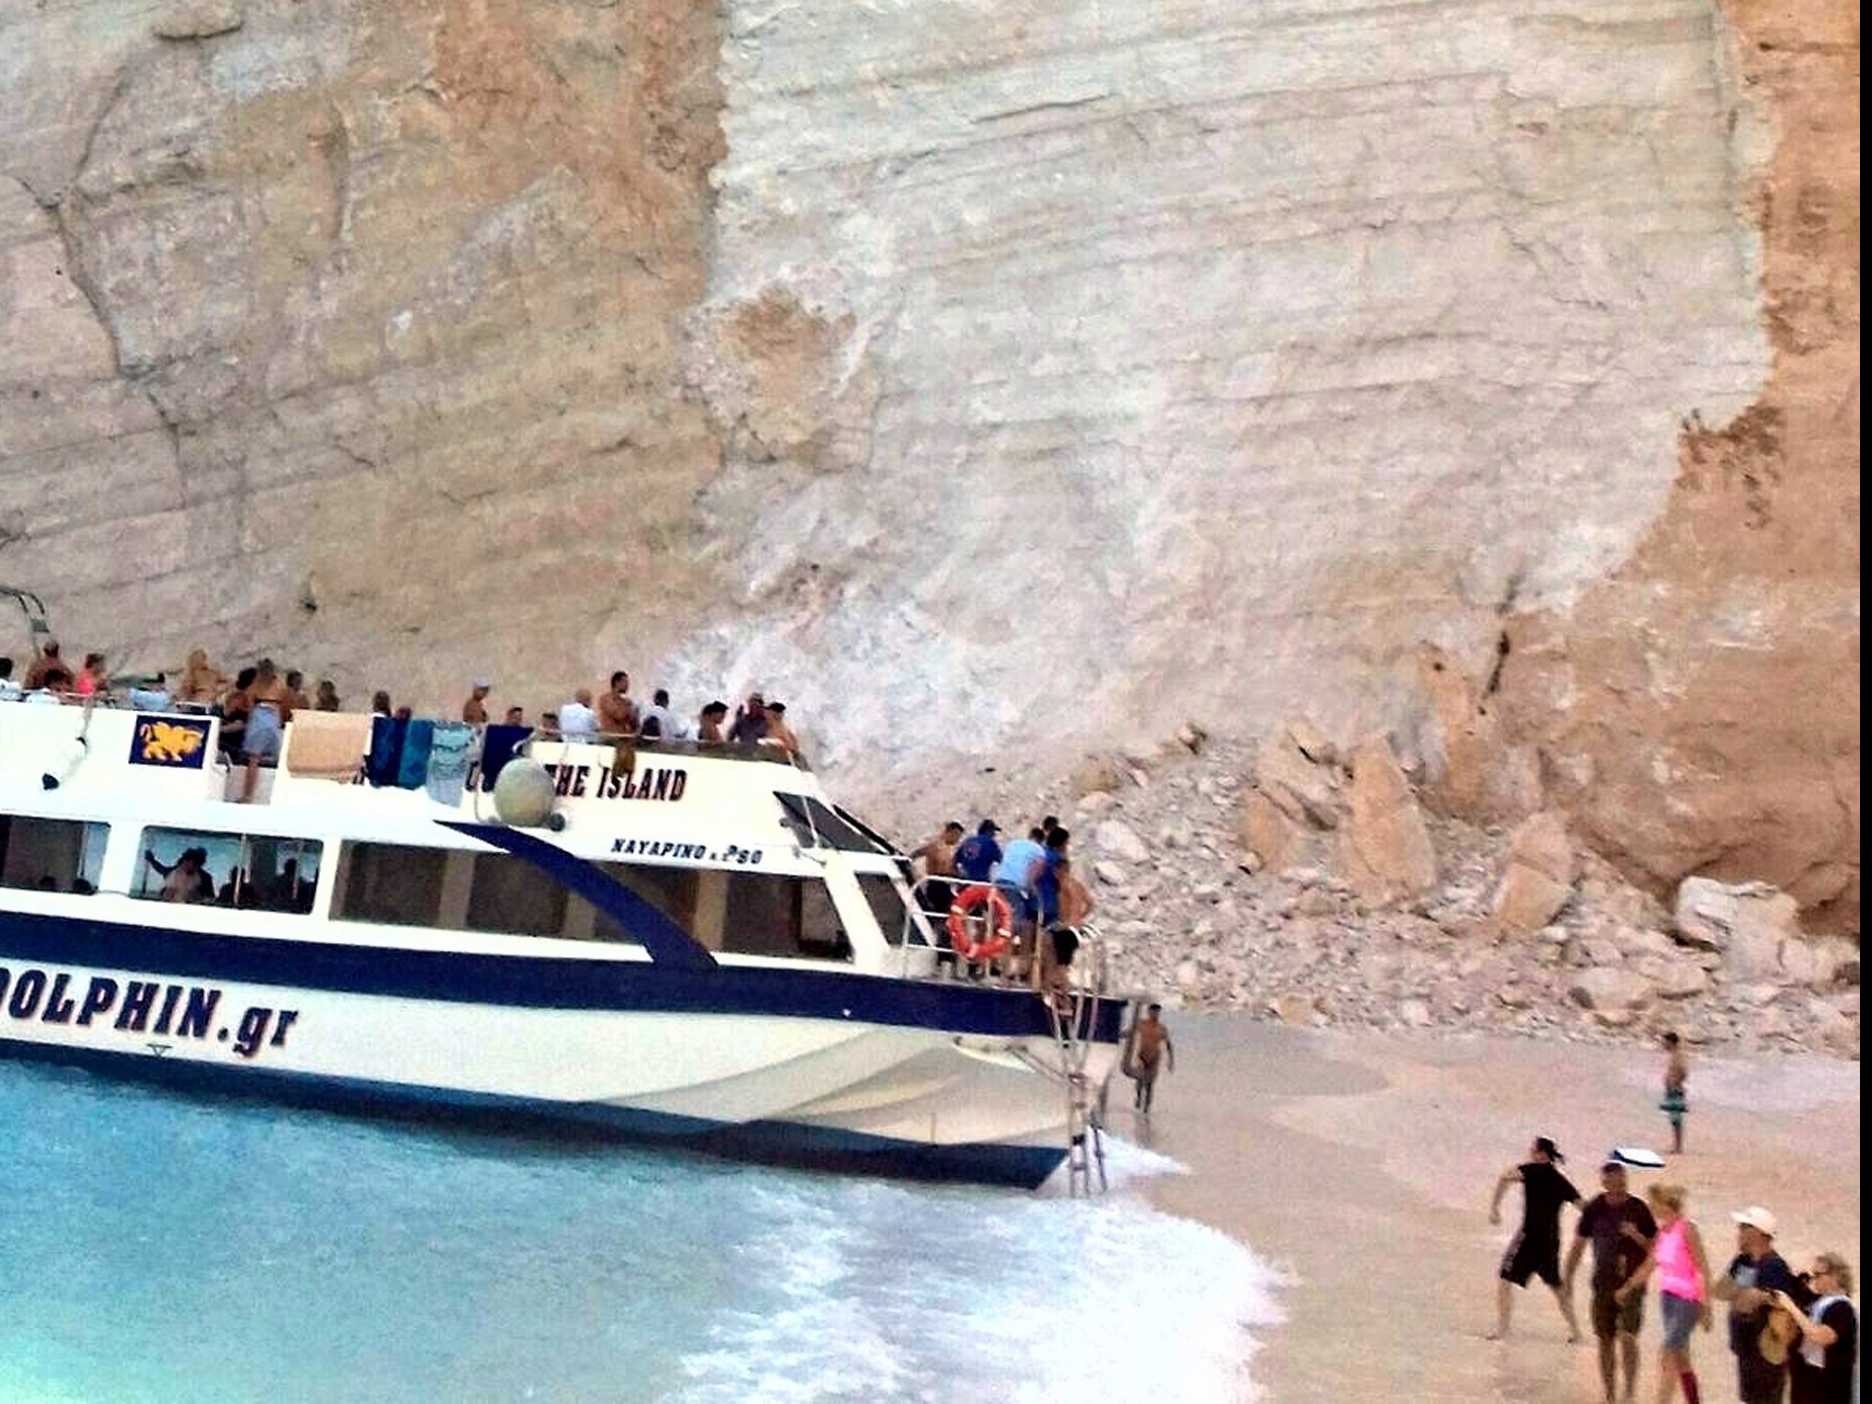 Landslide at Greek 'Shipwrecked' Beach Injures 7